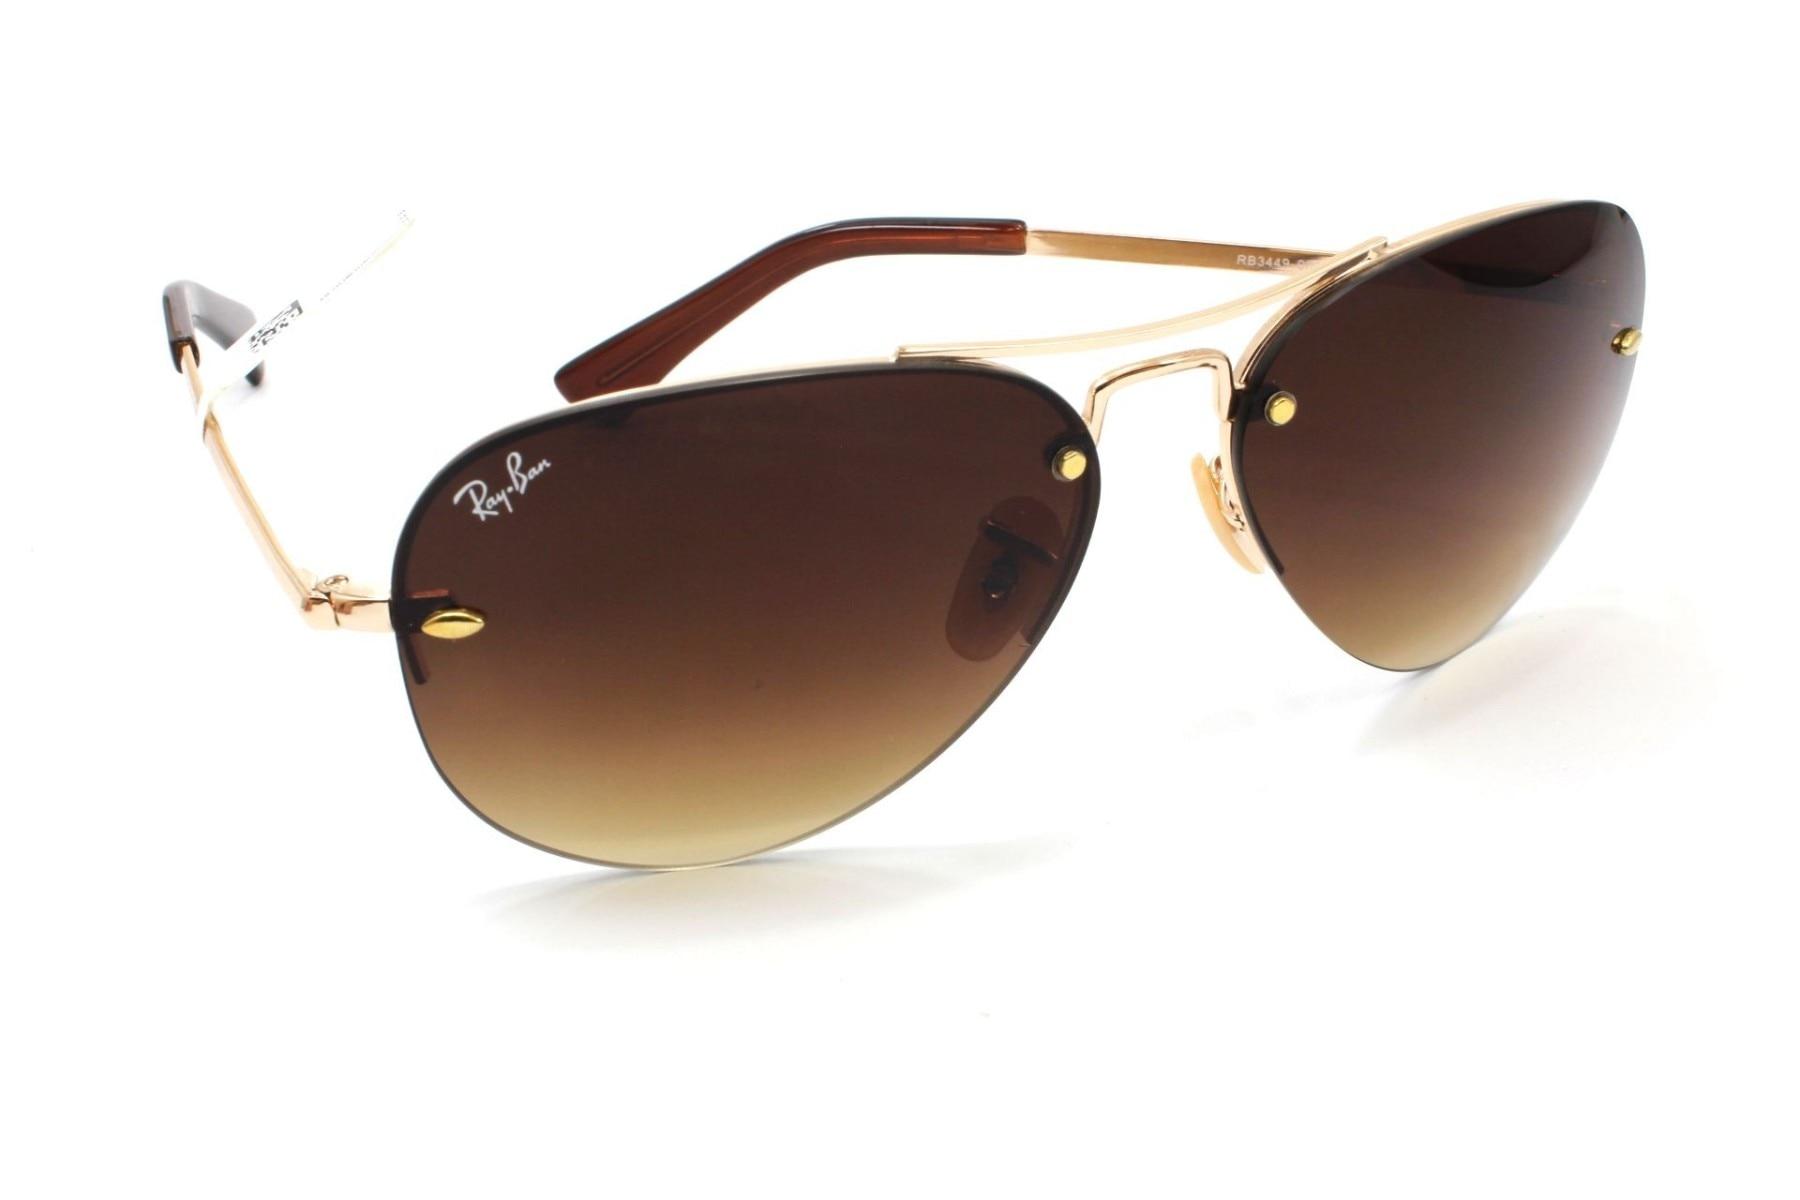 Armagano 3449 001/13 59 RAYBAN Sunglasses Quality and Original Sun Glasses